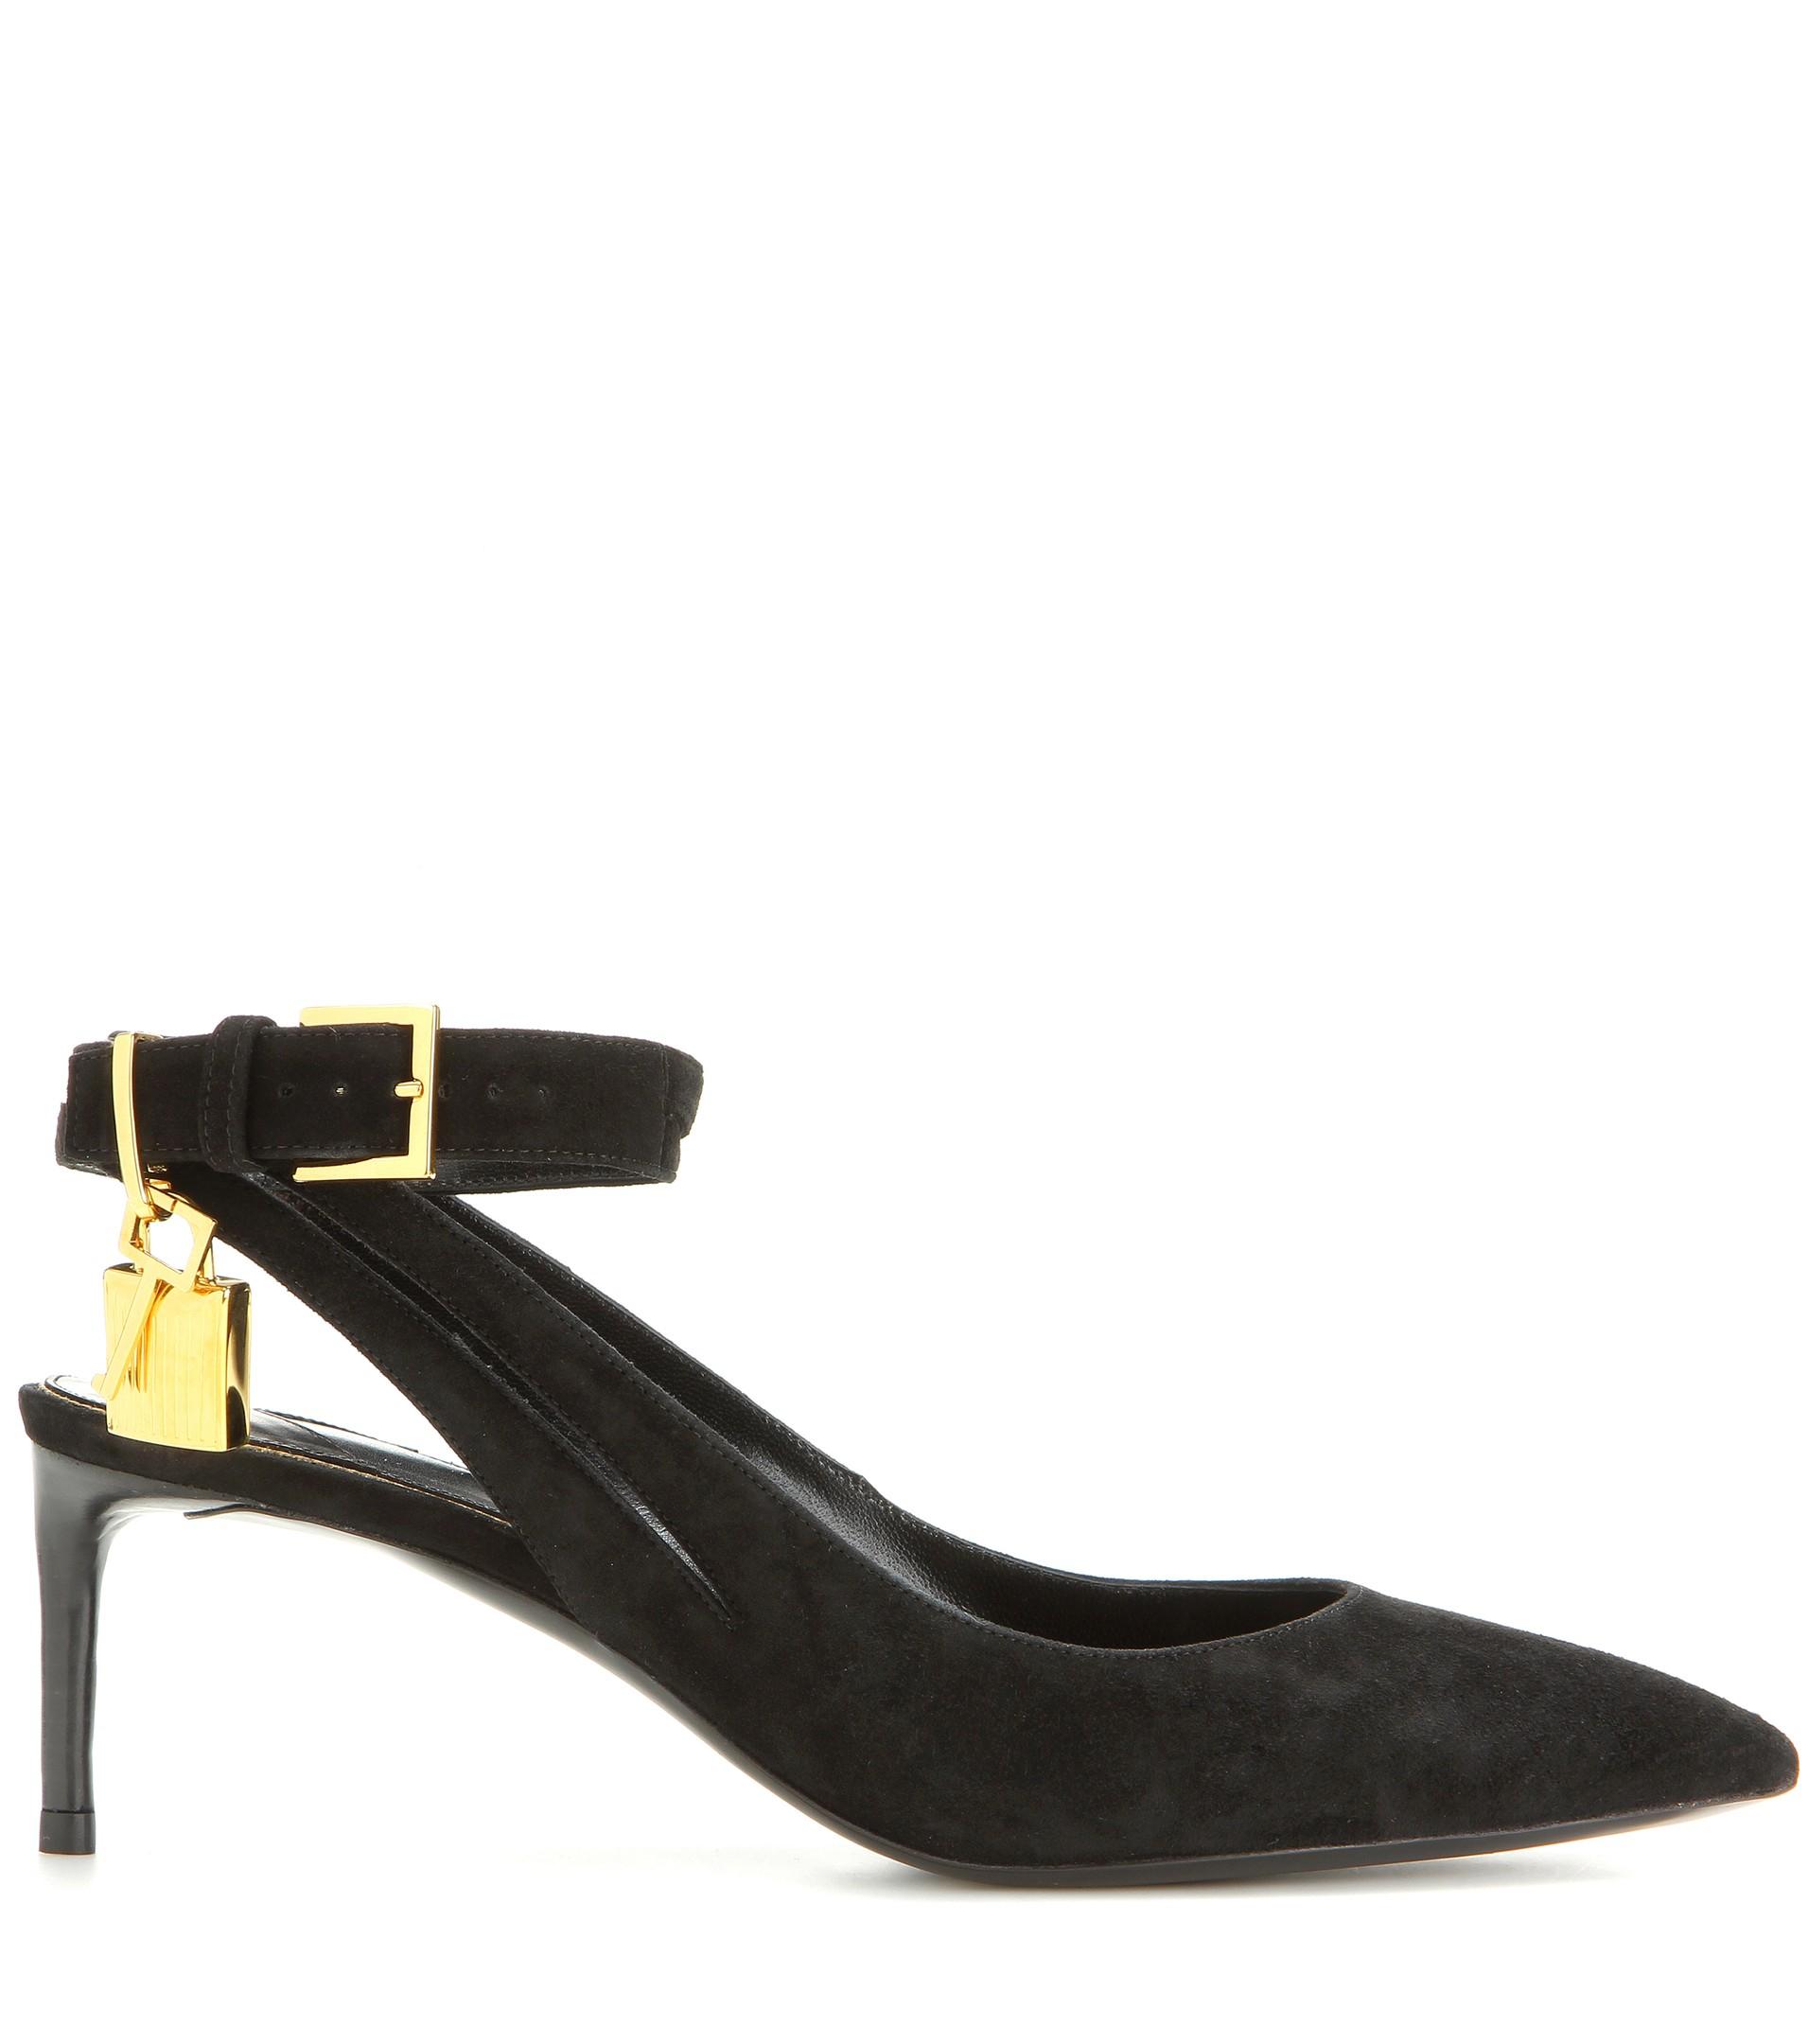 heels cognac products tom lock key lv cc gold ford leopard exotic monogram ballerina espadrille hair runway shop calf sz flats